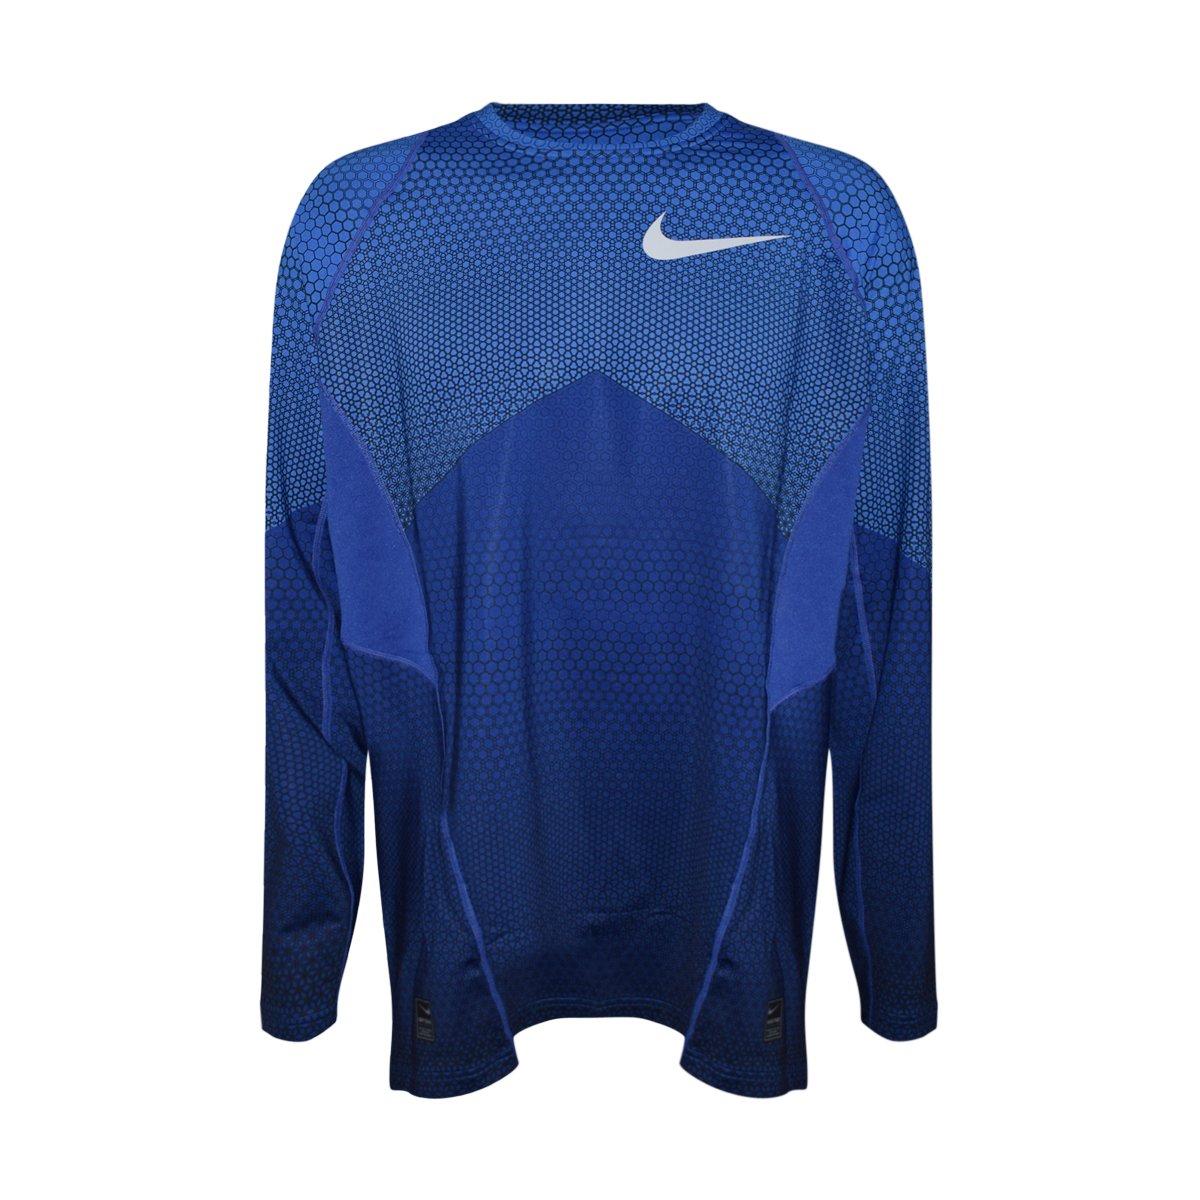 4d6f9e9f Nike Pro Combat Dri Fit Fitted Long Sleeve Shirt - DREAMWORKS